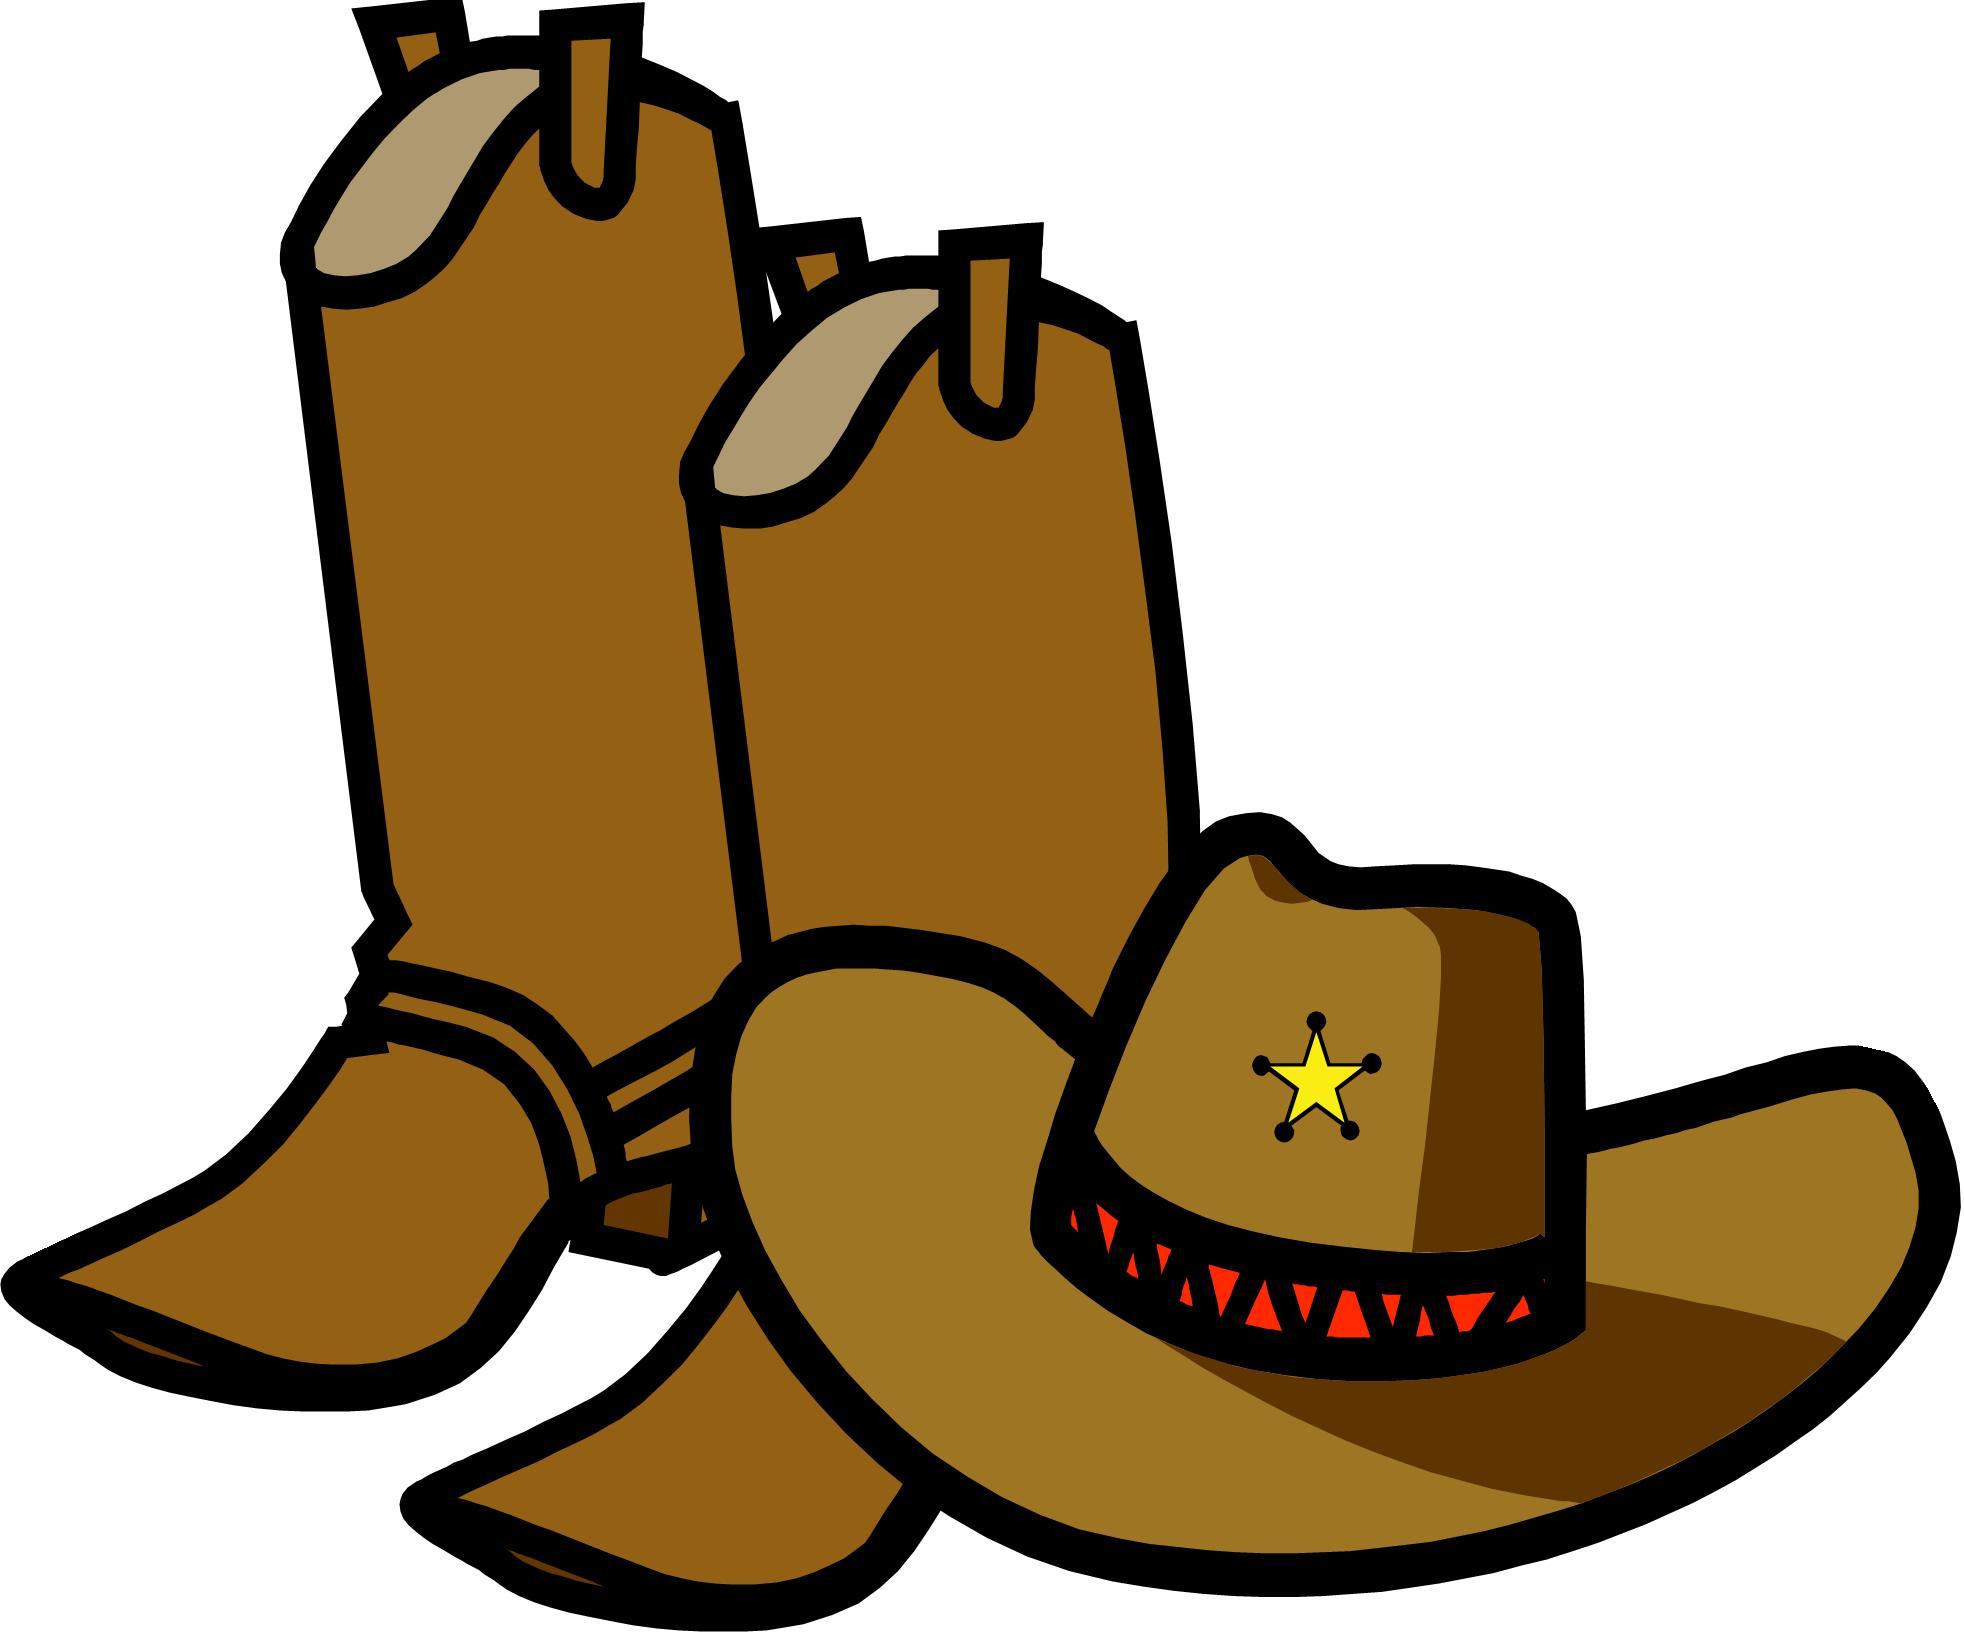 Cowboy clipart cowboy stuff. Wild west free download